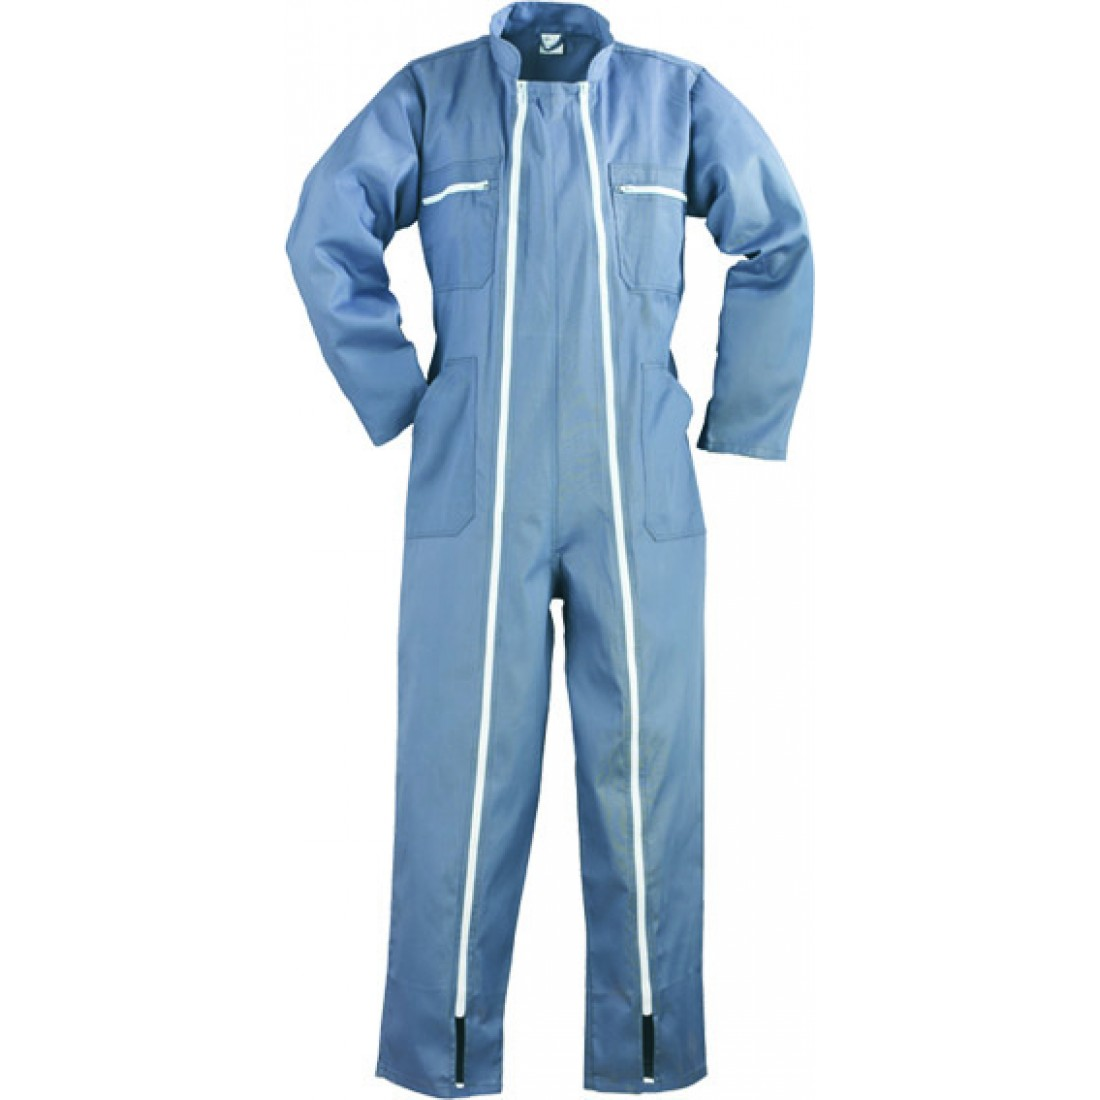 3dc243ad2e30 Ενδυση Εργασιας - Ολόσωμη Φόρμα Με 2 Φερμουάρ Coverguard